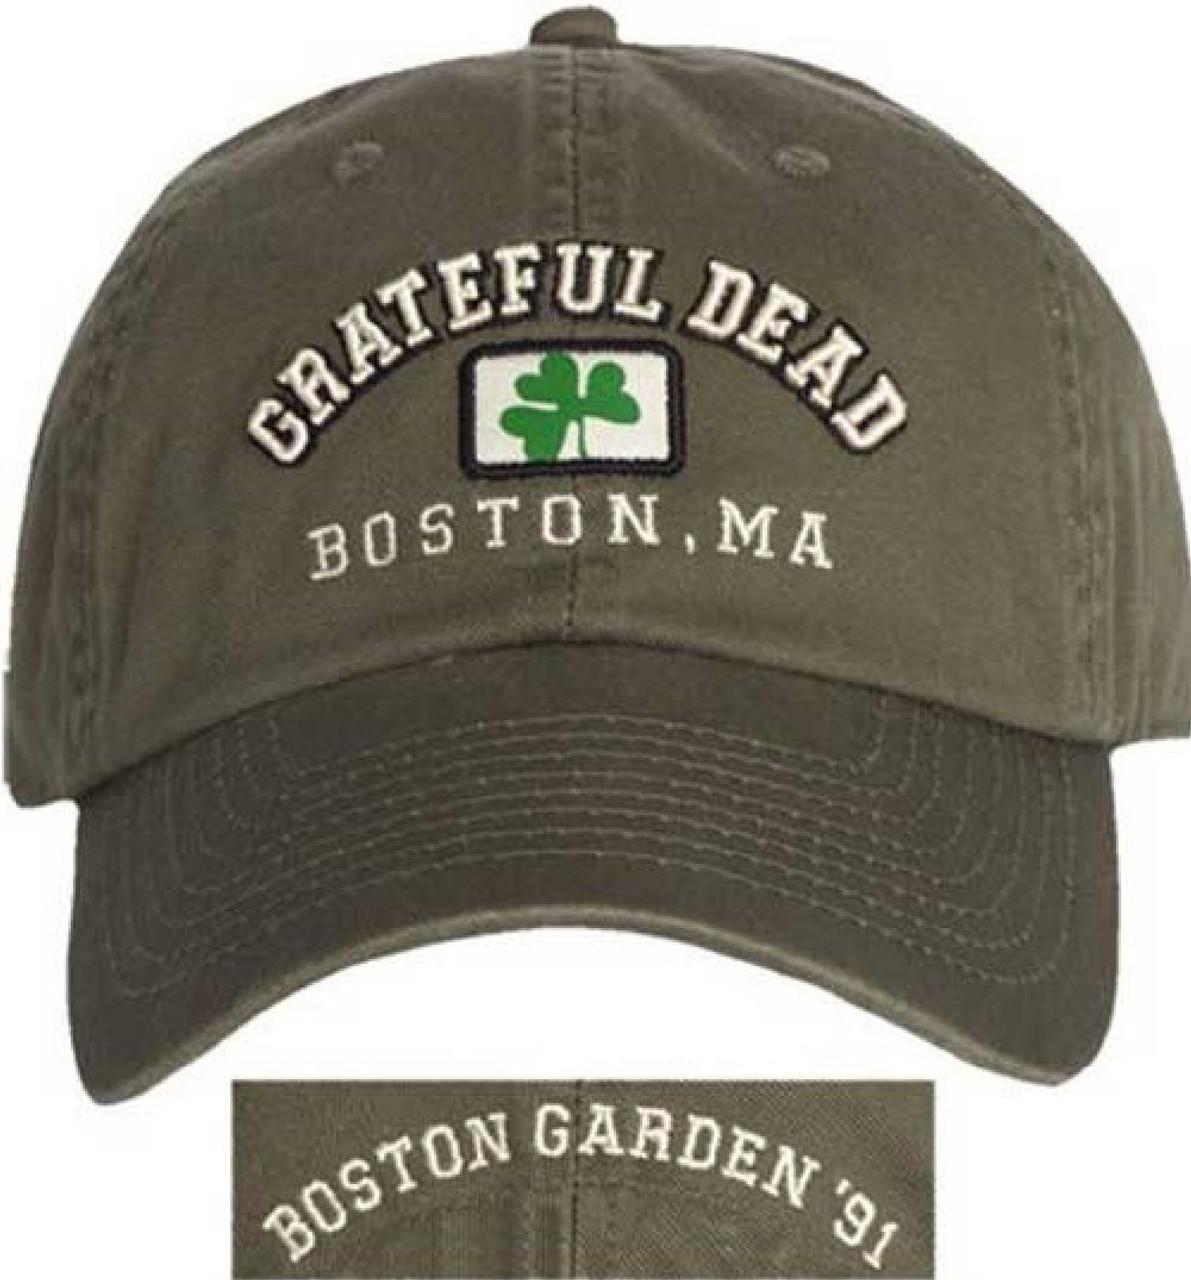 Grateful Dead Tour Hat - Boston Garden 1991 | Green Baseball Cap ...